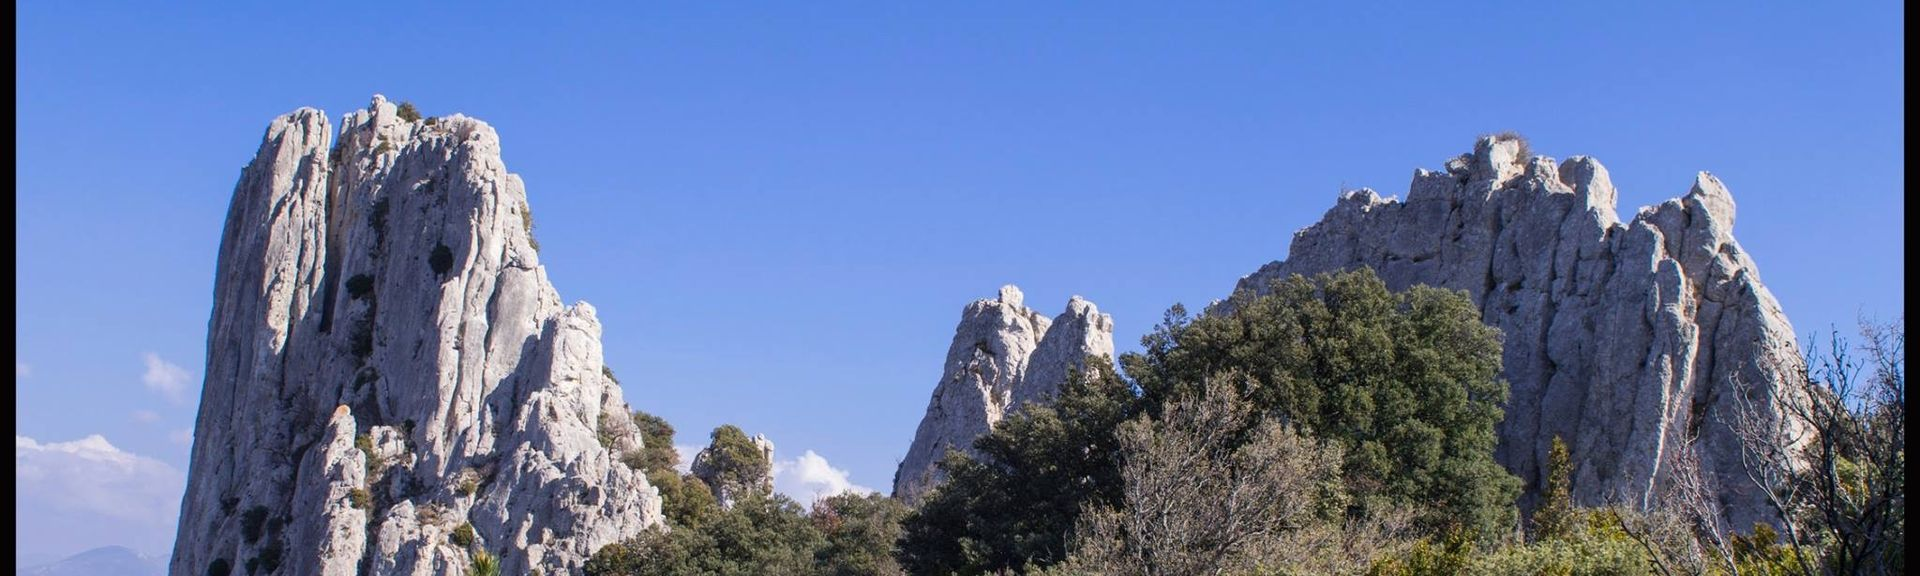 Vaucluse, Provence-Alpes-Côte d'Azur, Frankrike